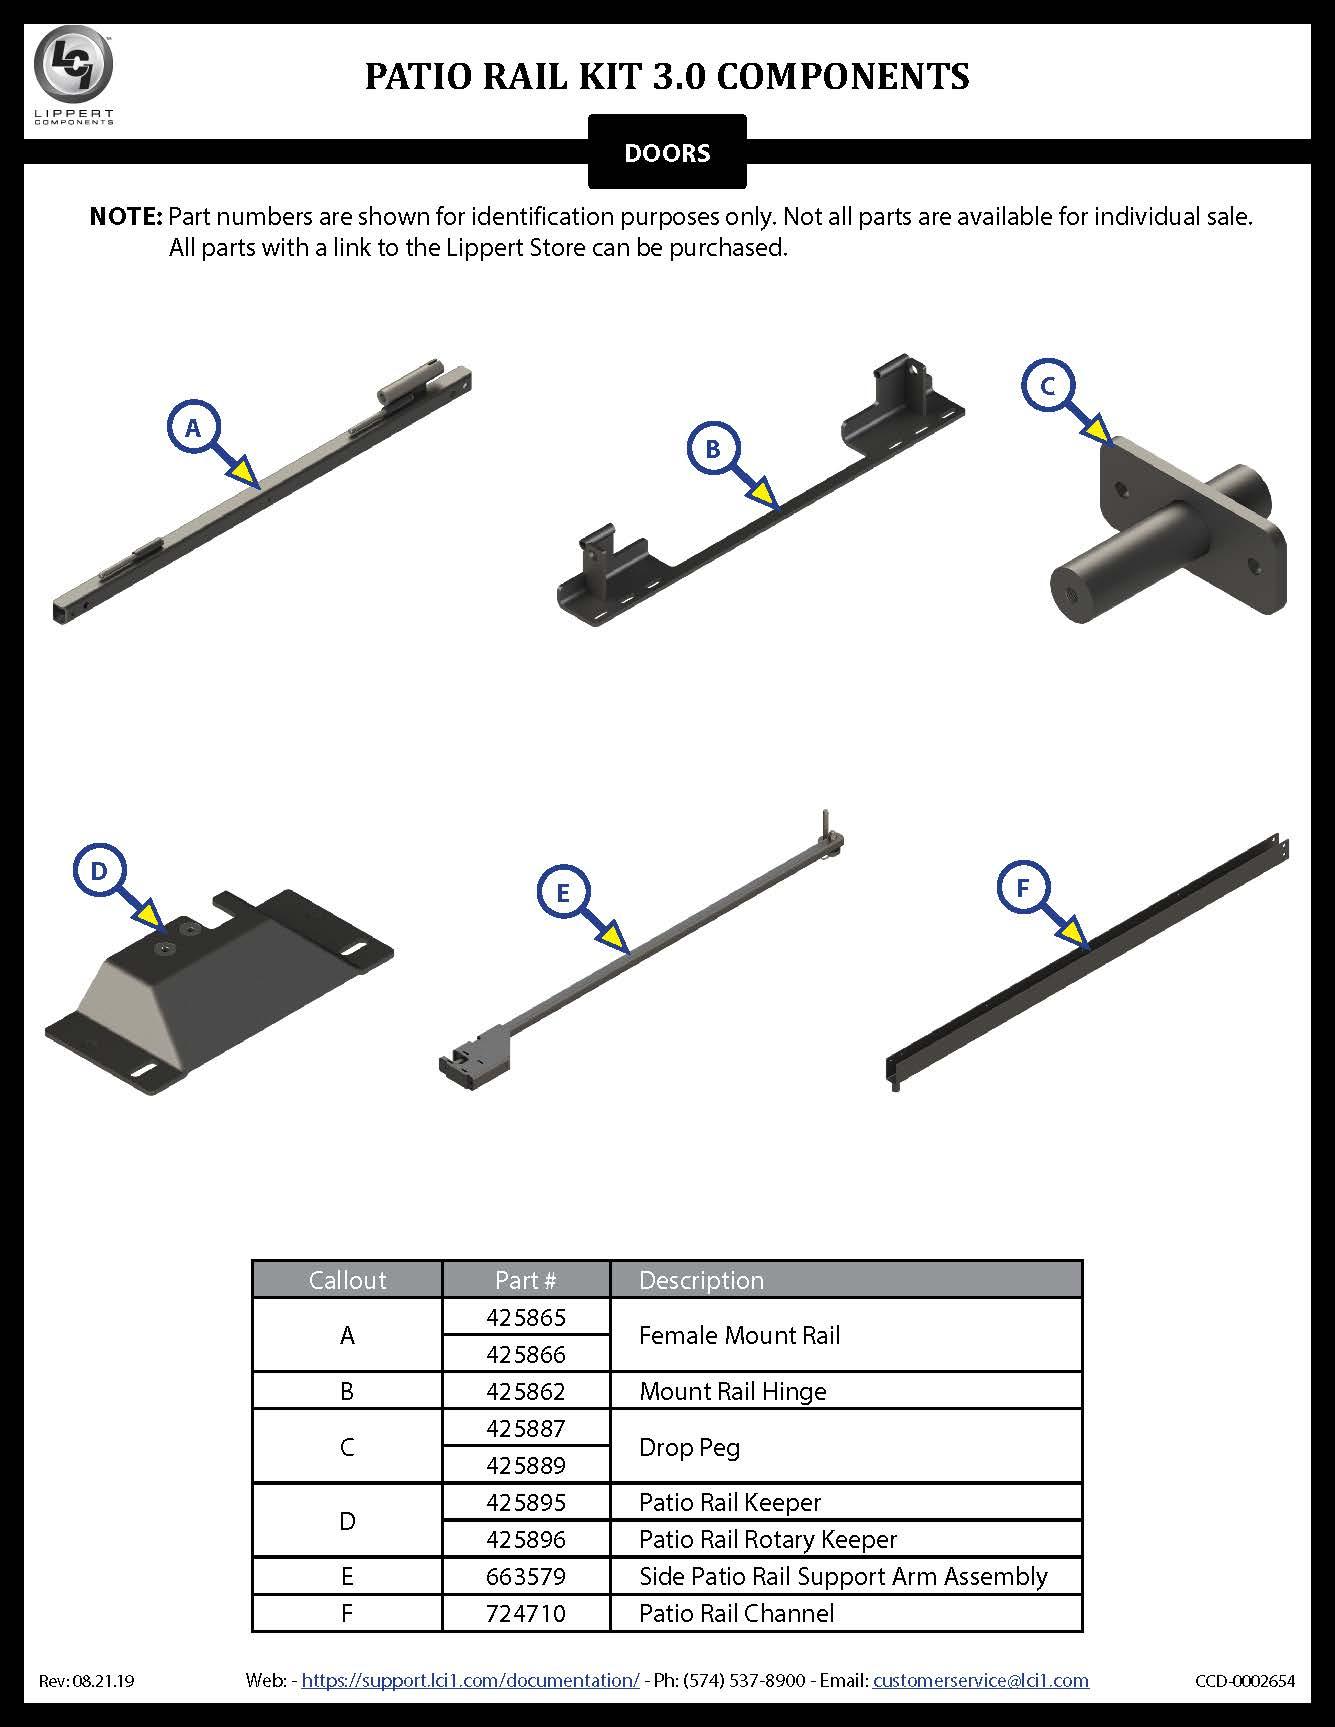 Patio Rail Kit 3.0 Components